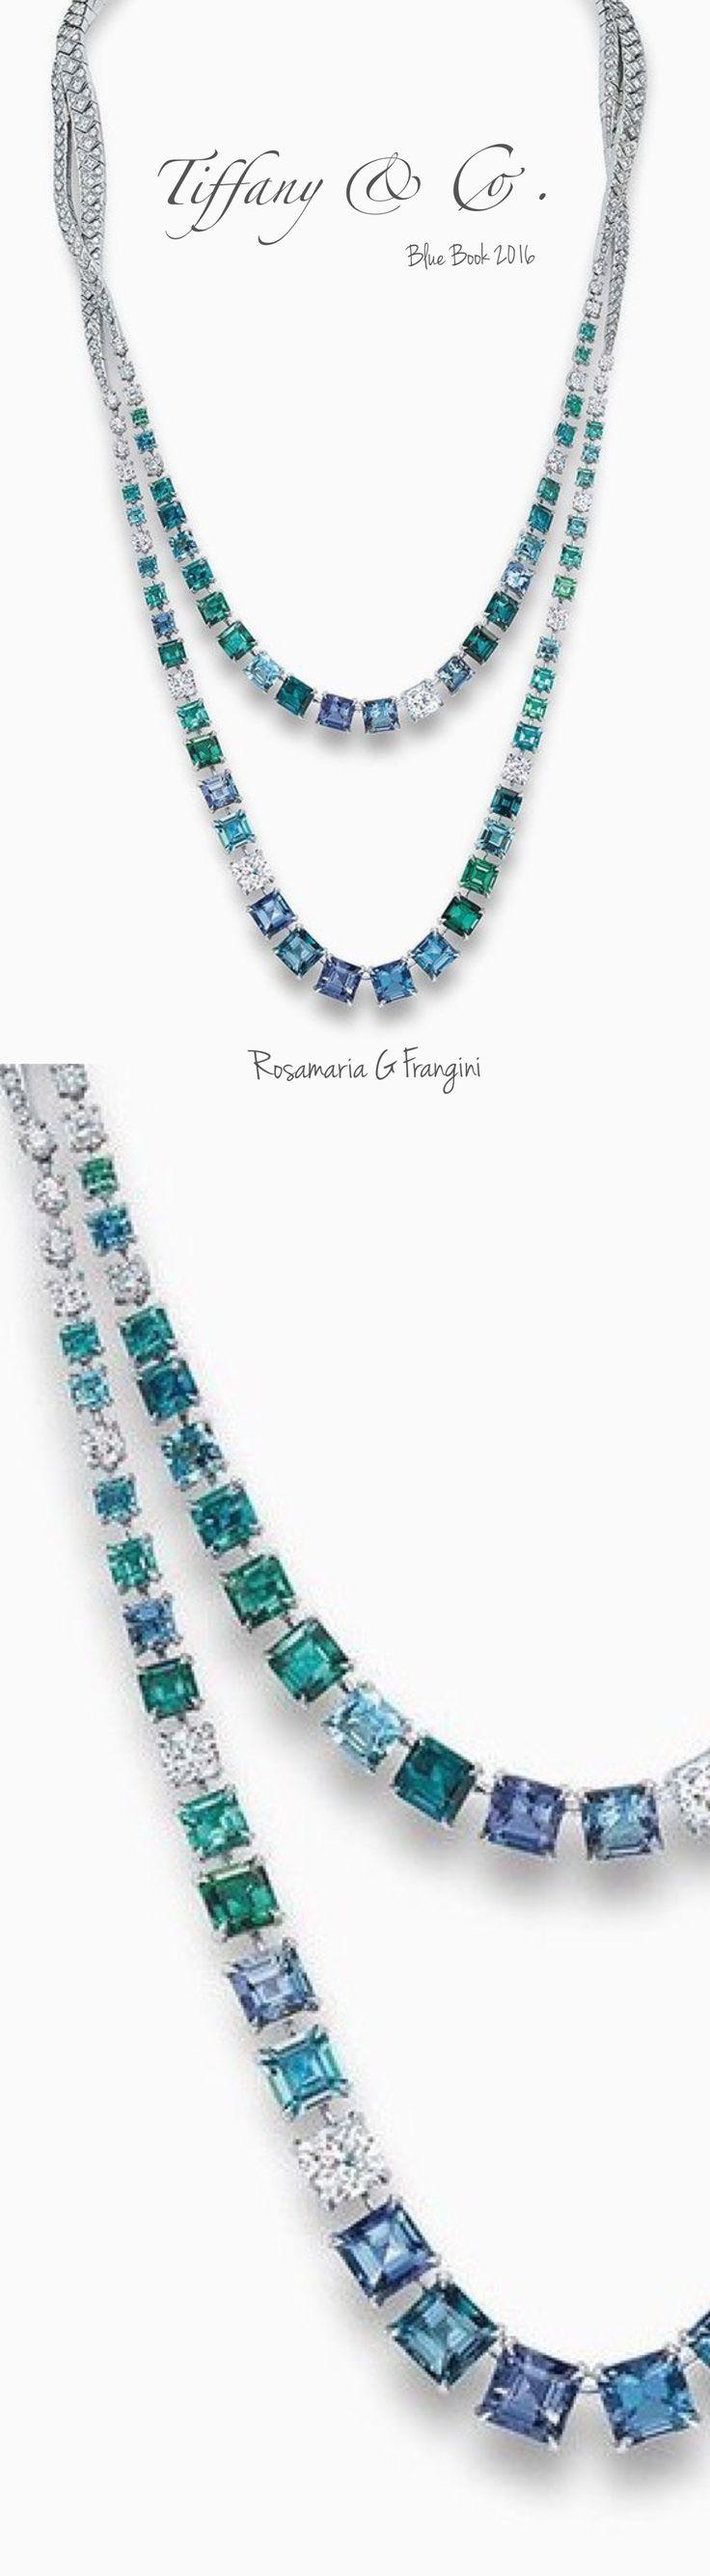 Rosamaria G Frangini | High Deep Blue Jewellery | TJS | Tiffany & Co. Blue Book 2016